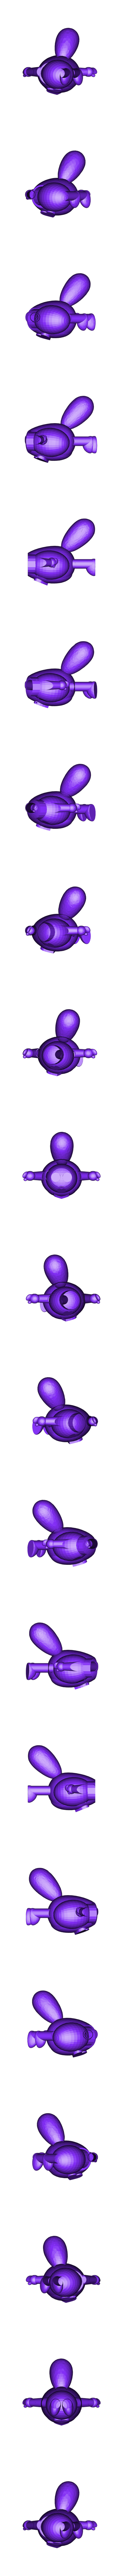 Lemur king02ok.stl Download free STL file Cute animal - lemur king potted • 3D printing model, mingshiuan